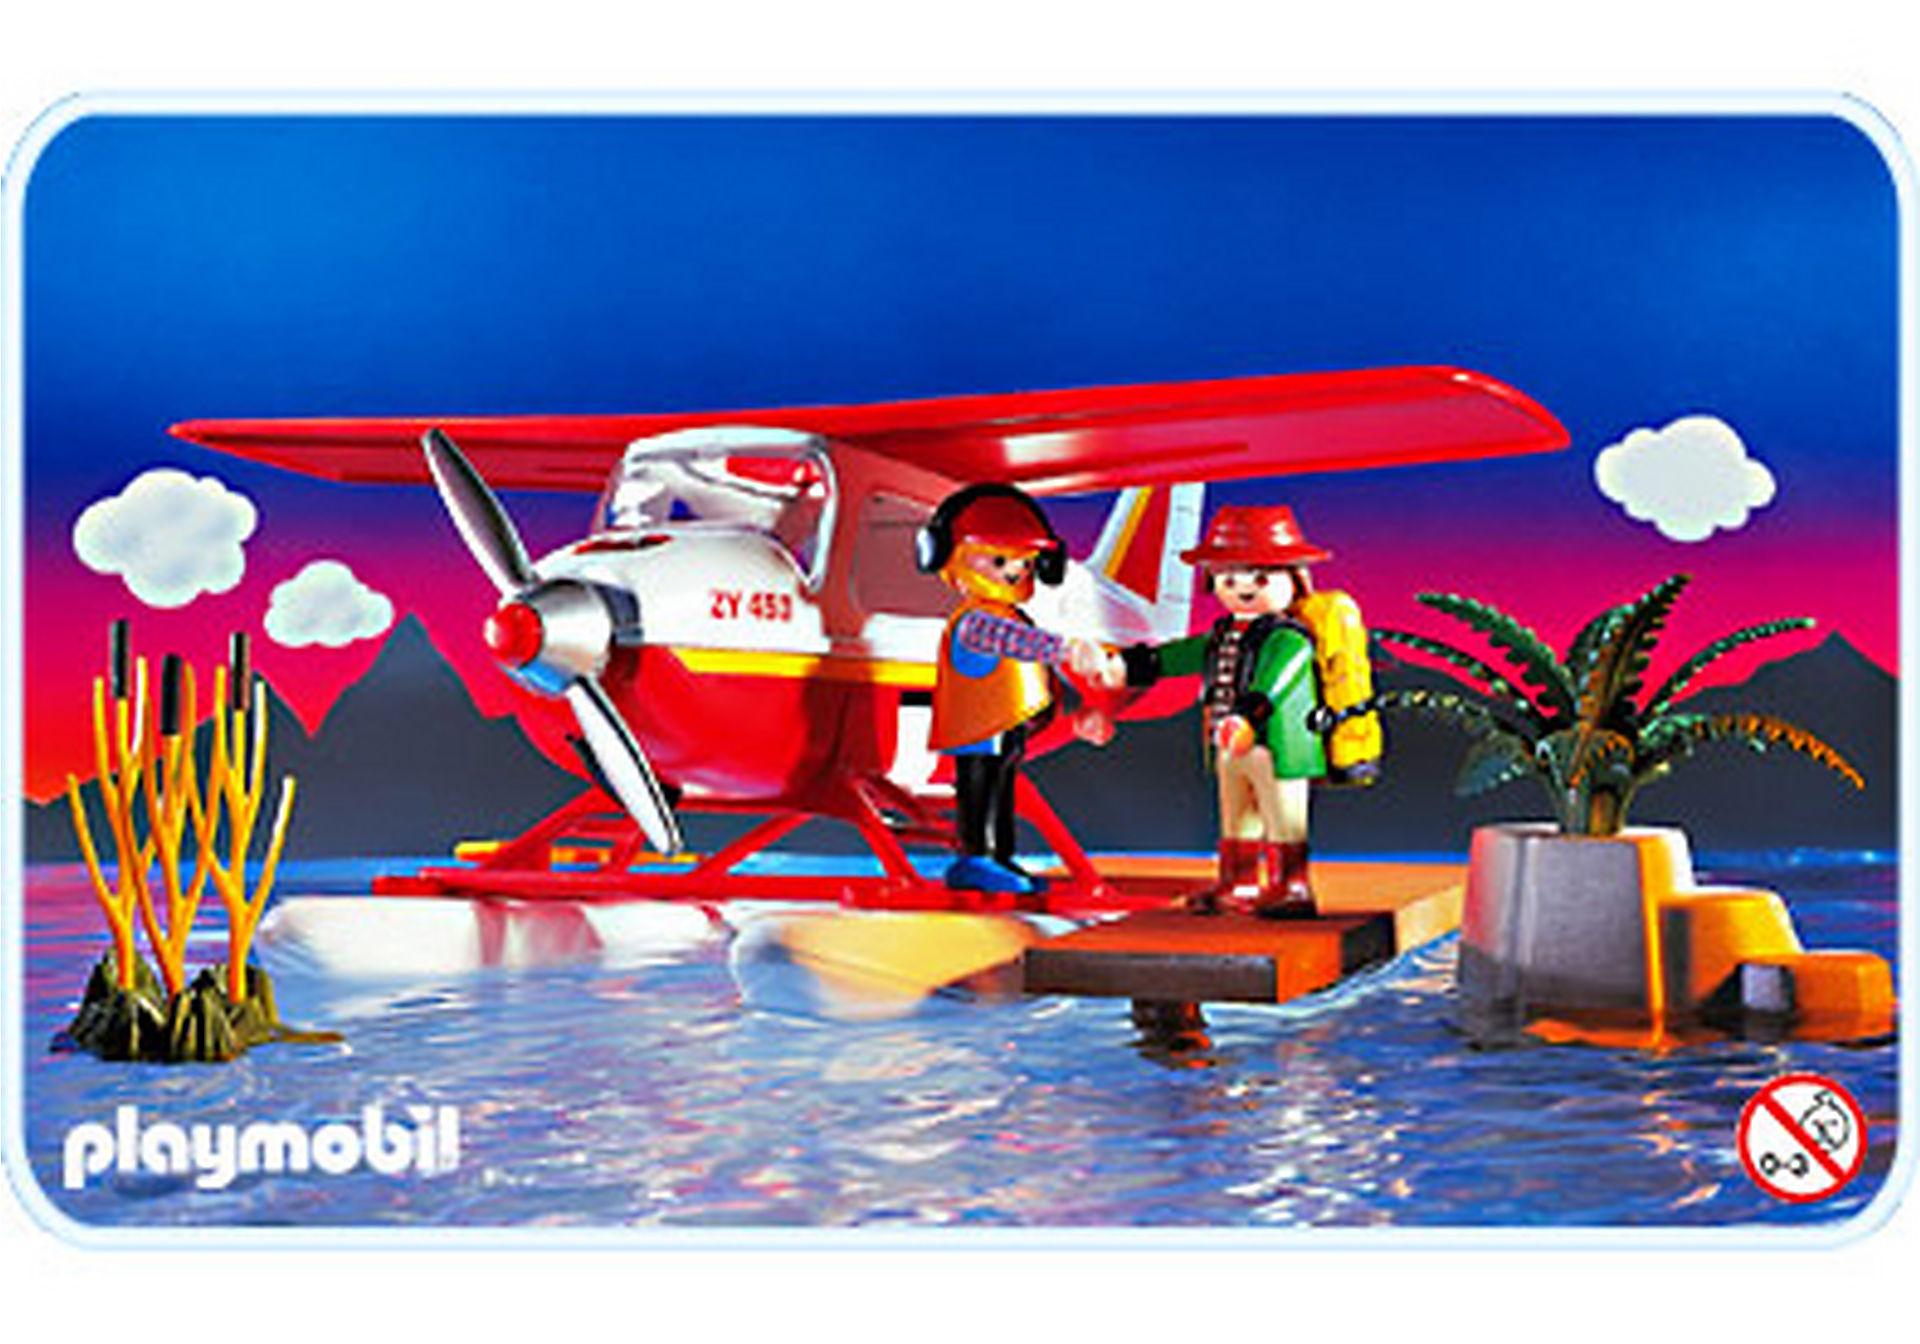 3866-A Wasserflugzeug zoom image1